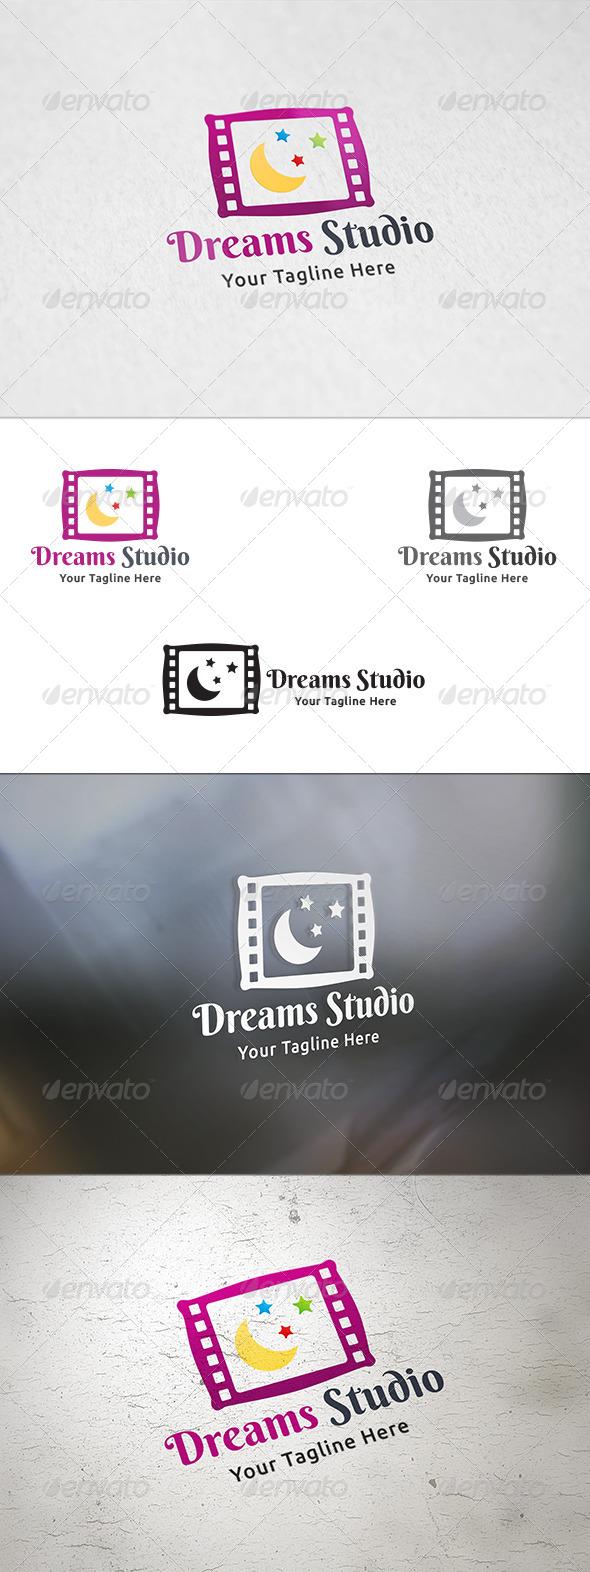 Dreams Studio - Logo Template